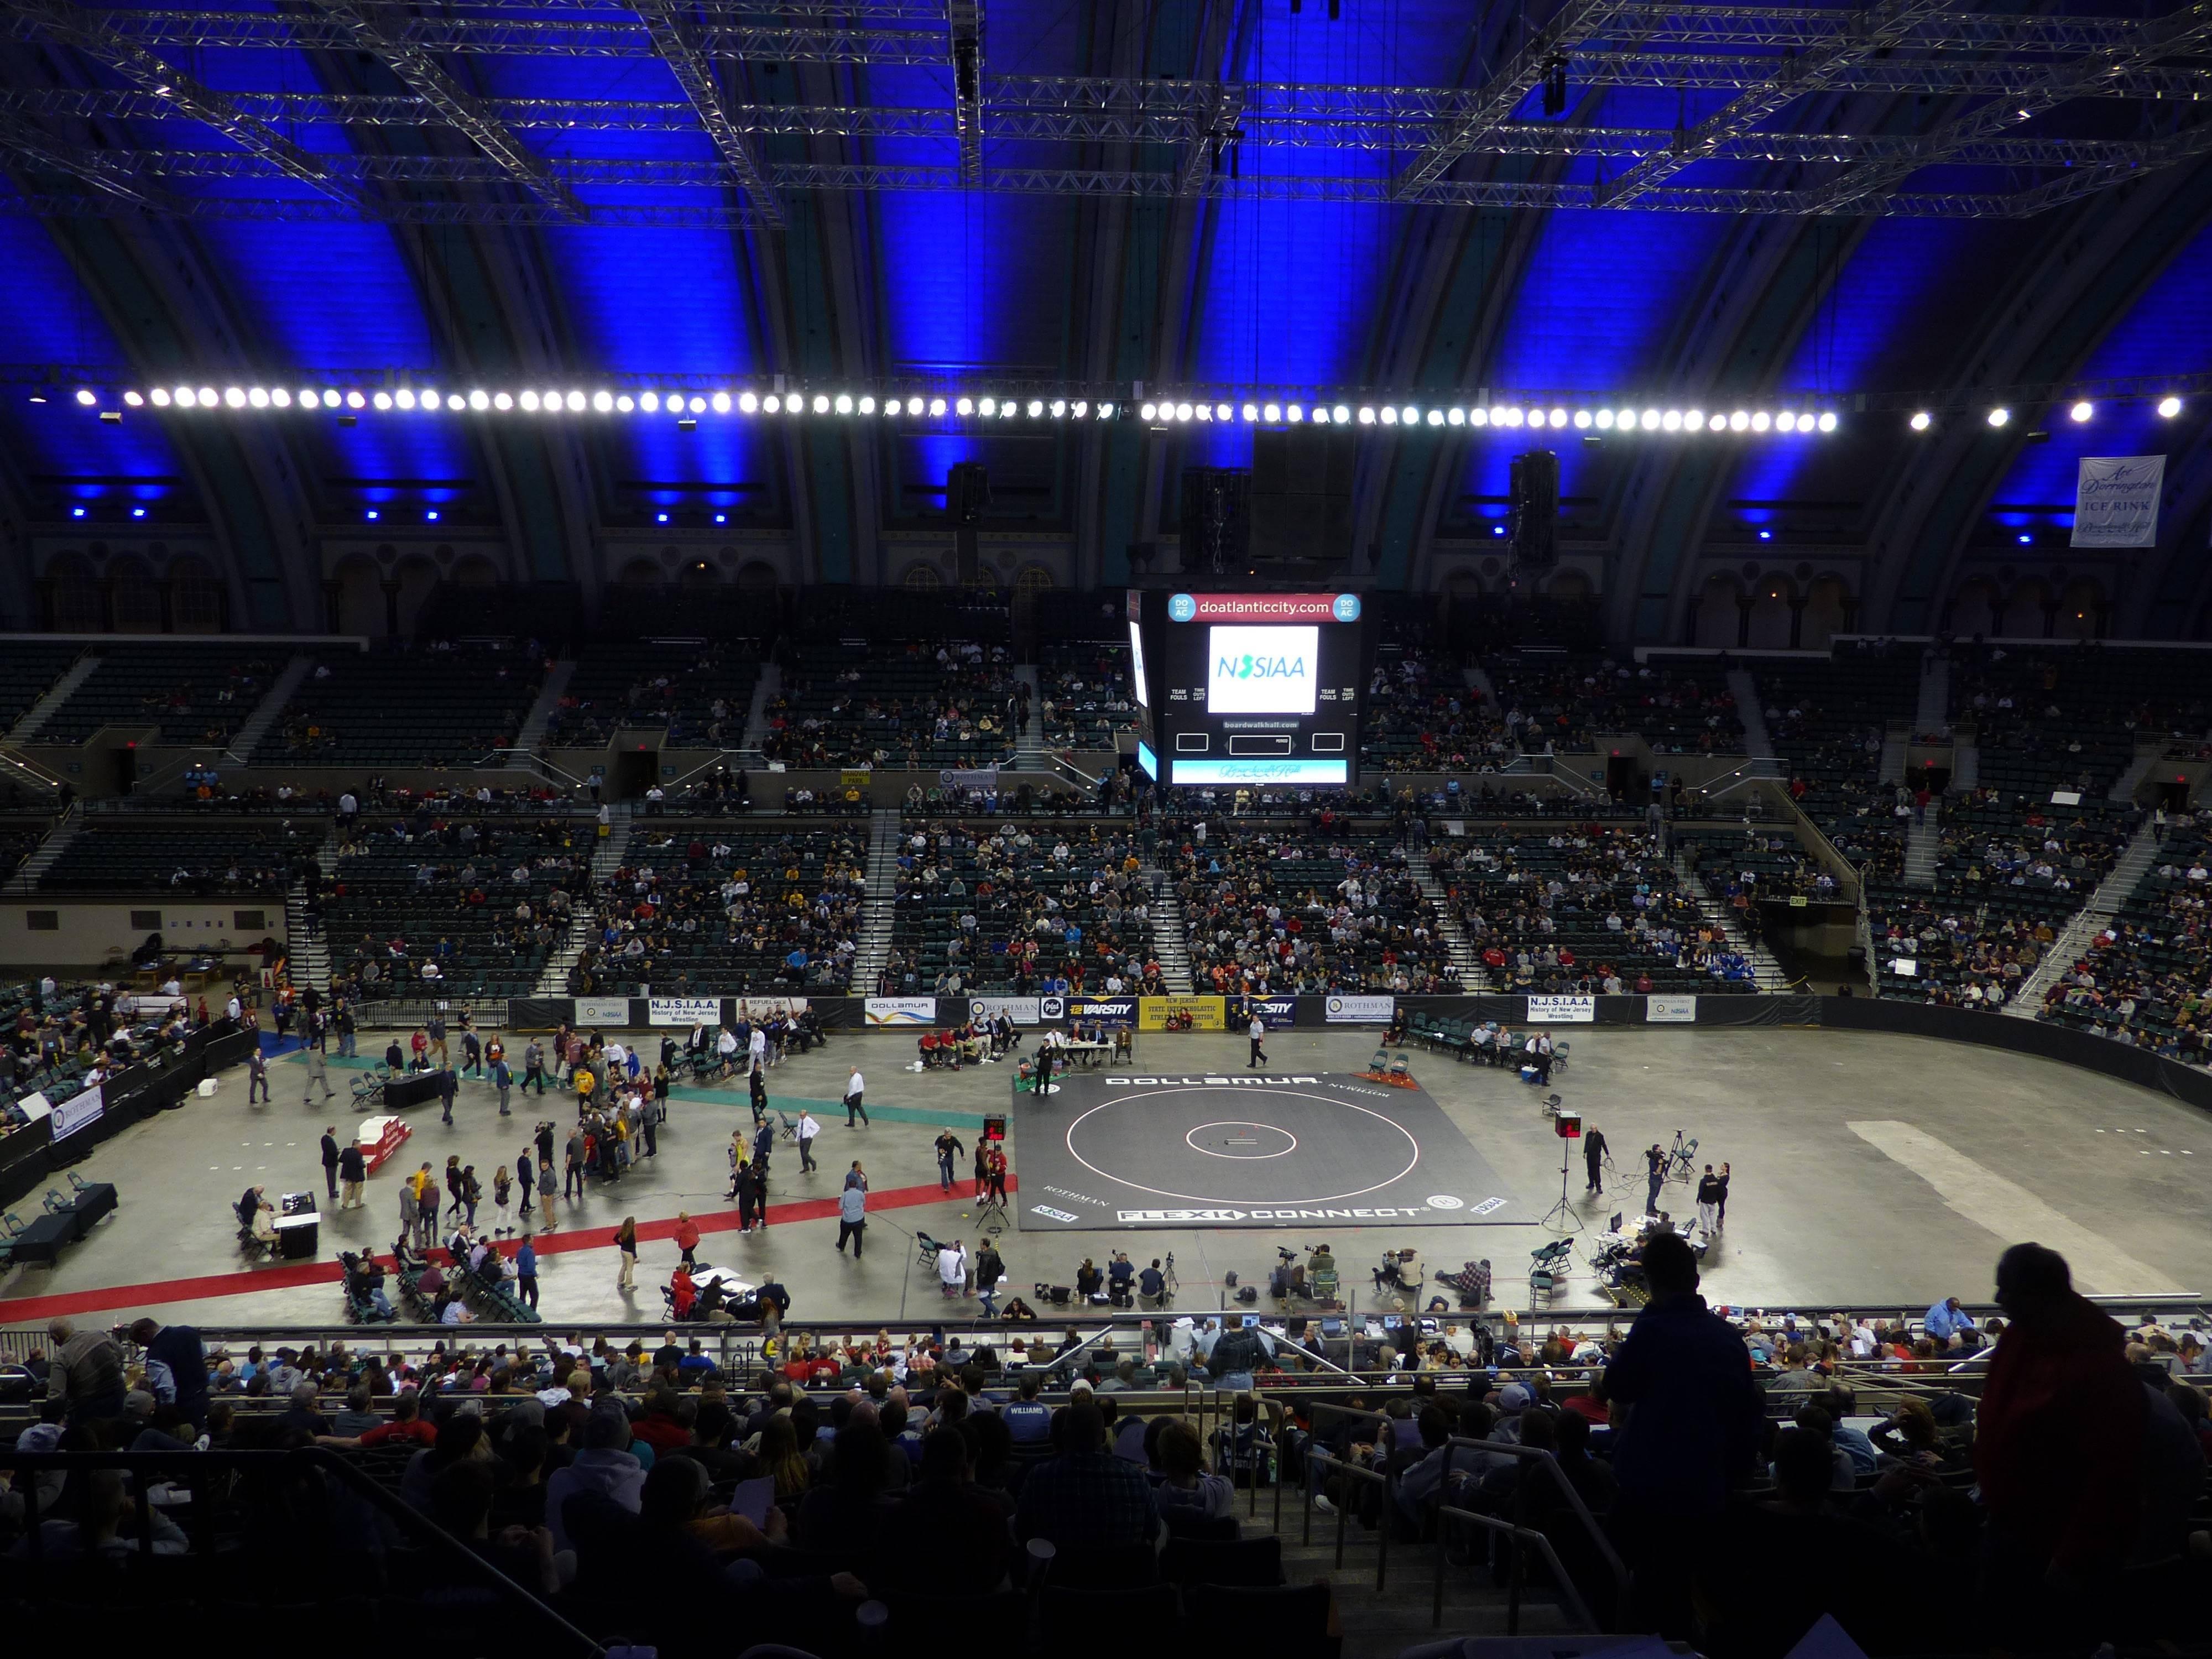 951f1afbfbe6143efecf_2017_NJSIAA_Wrestling_Championships.jpg